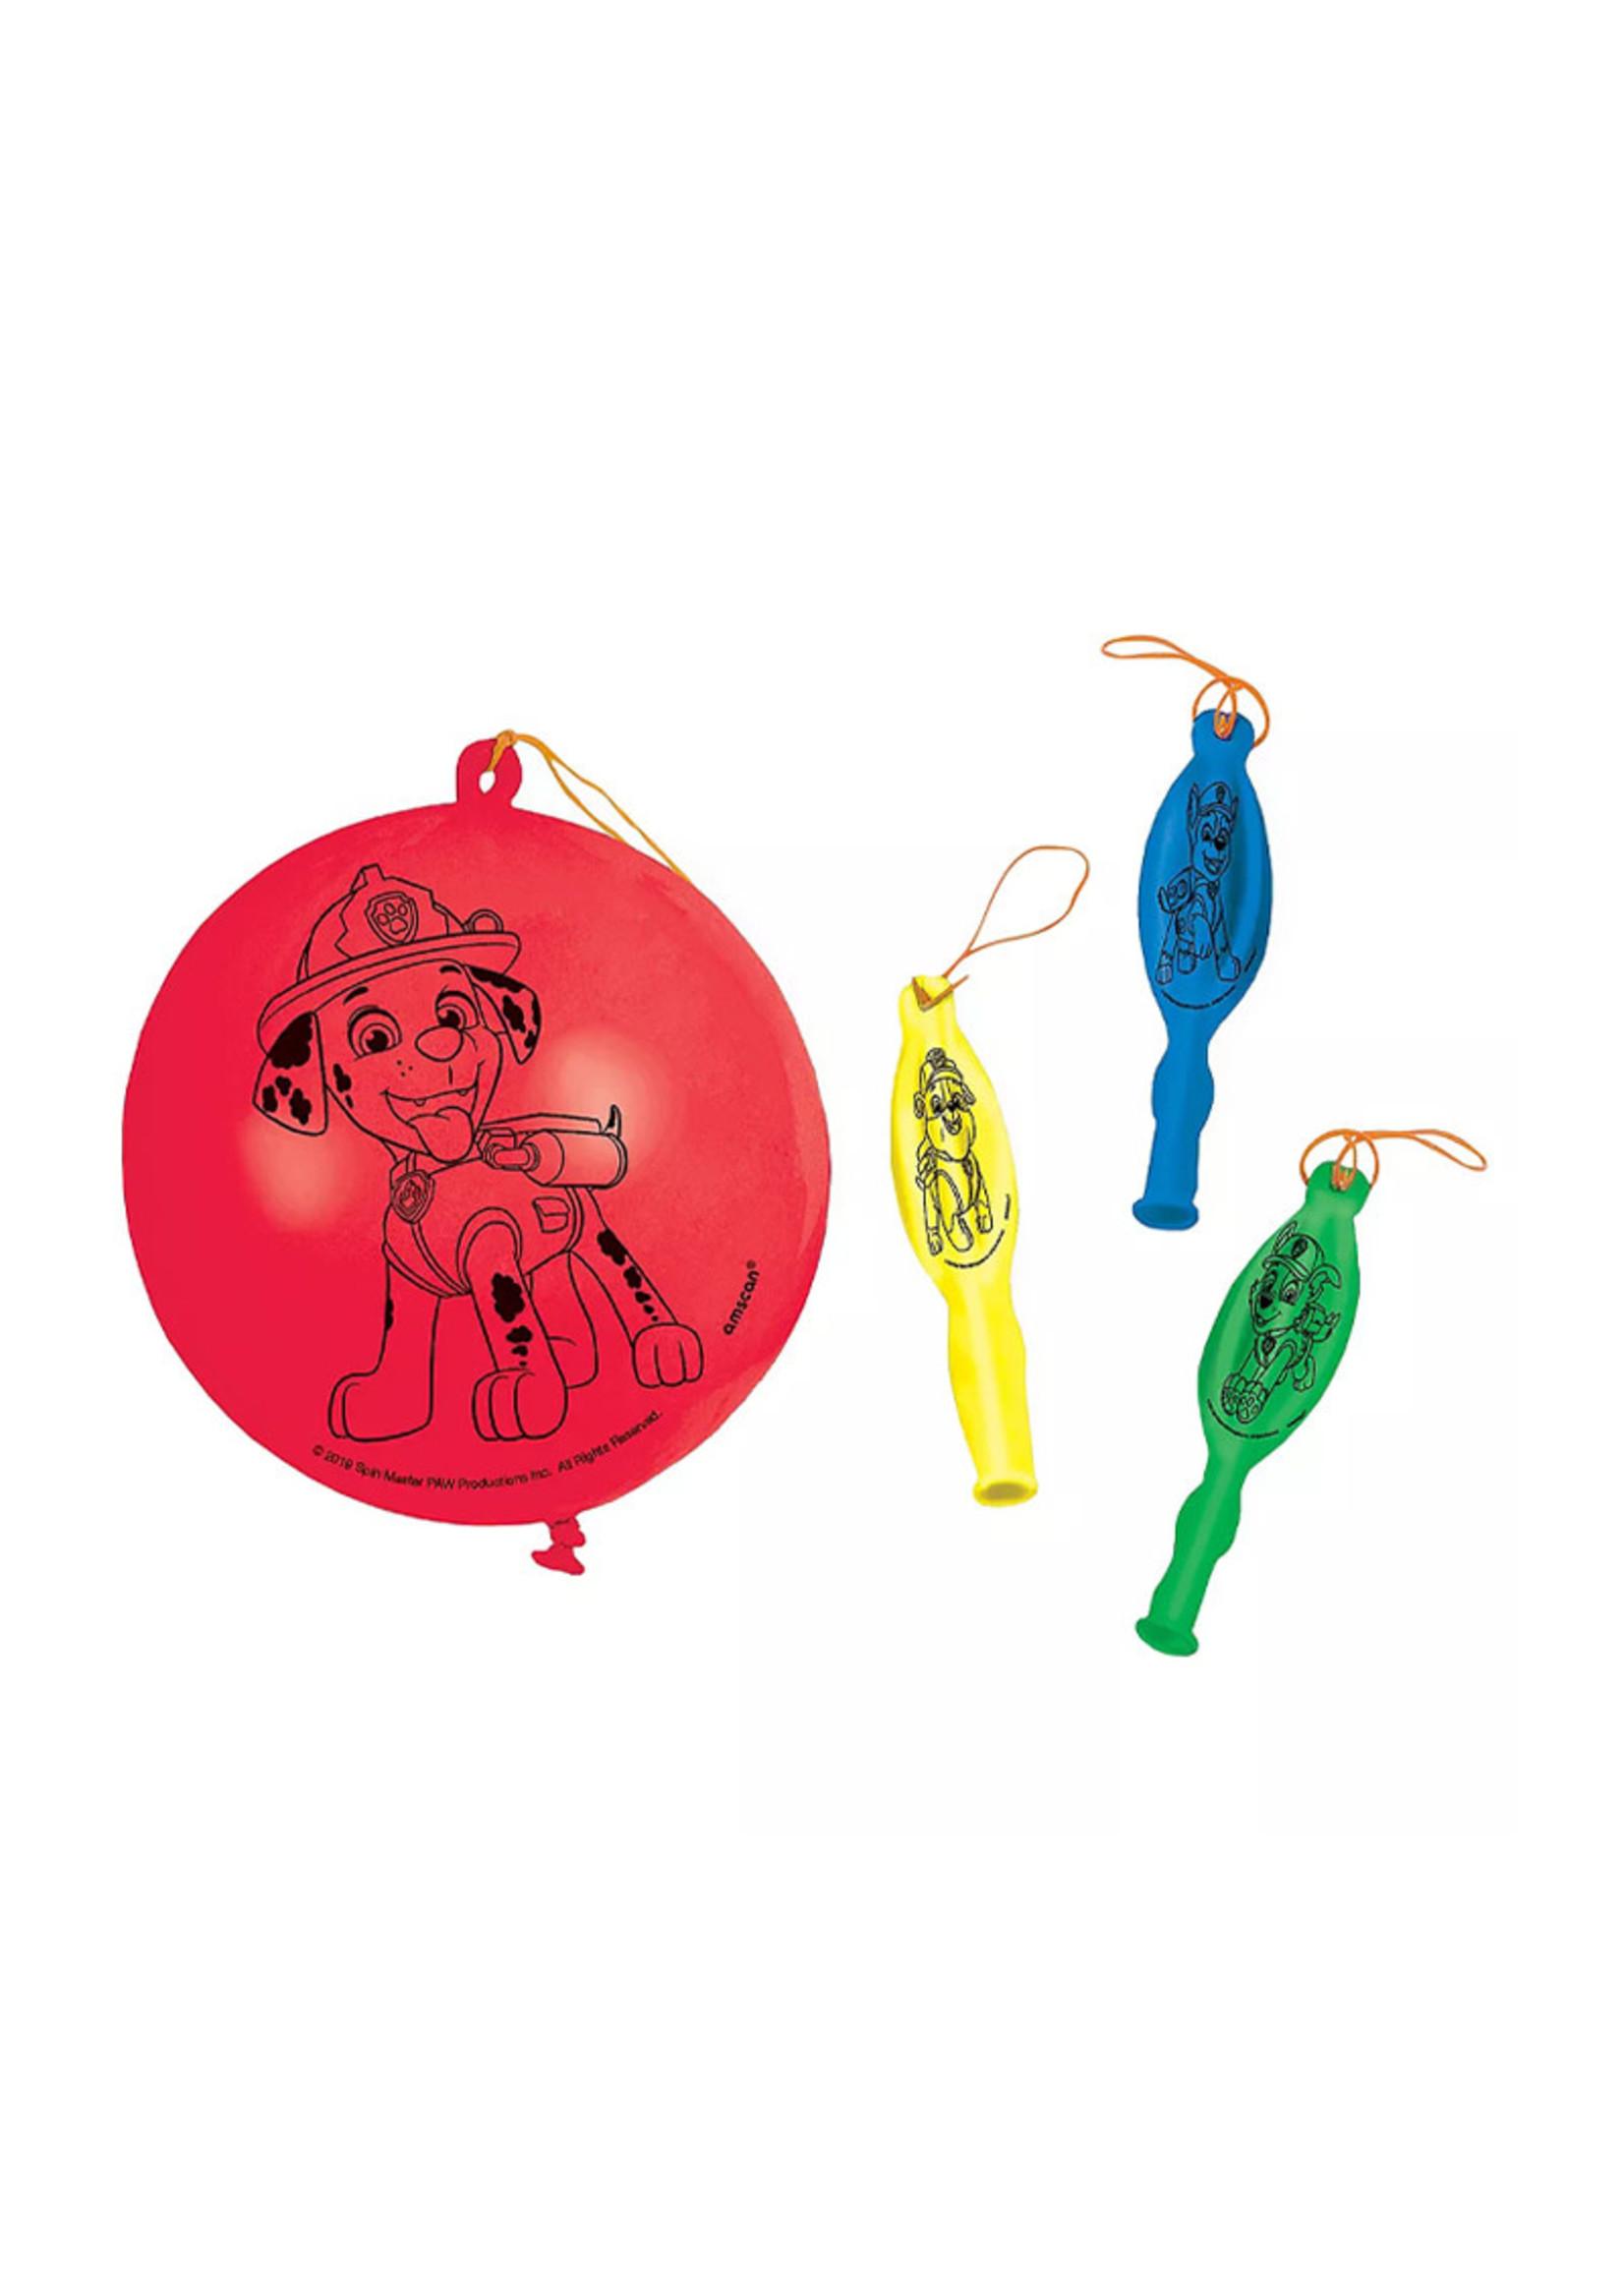 PAW Patrol Adventure Punch Balloons 4ct